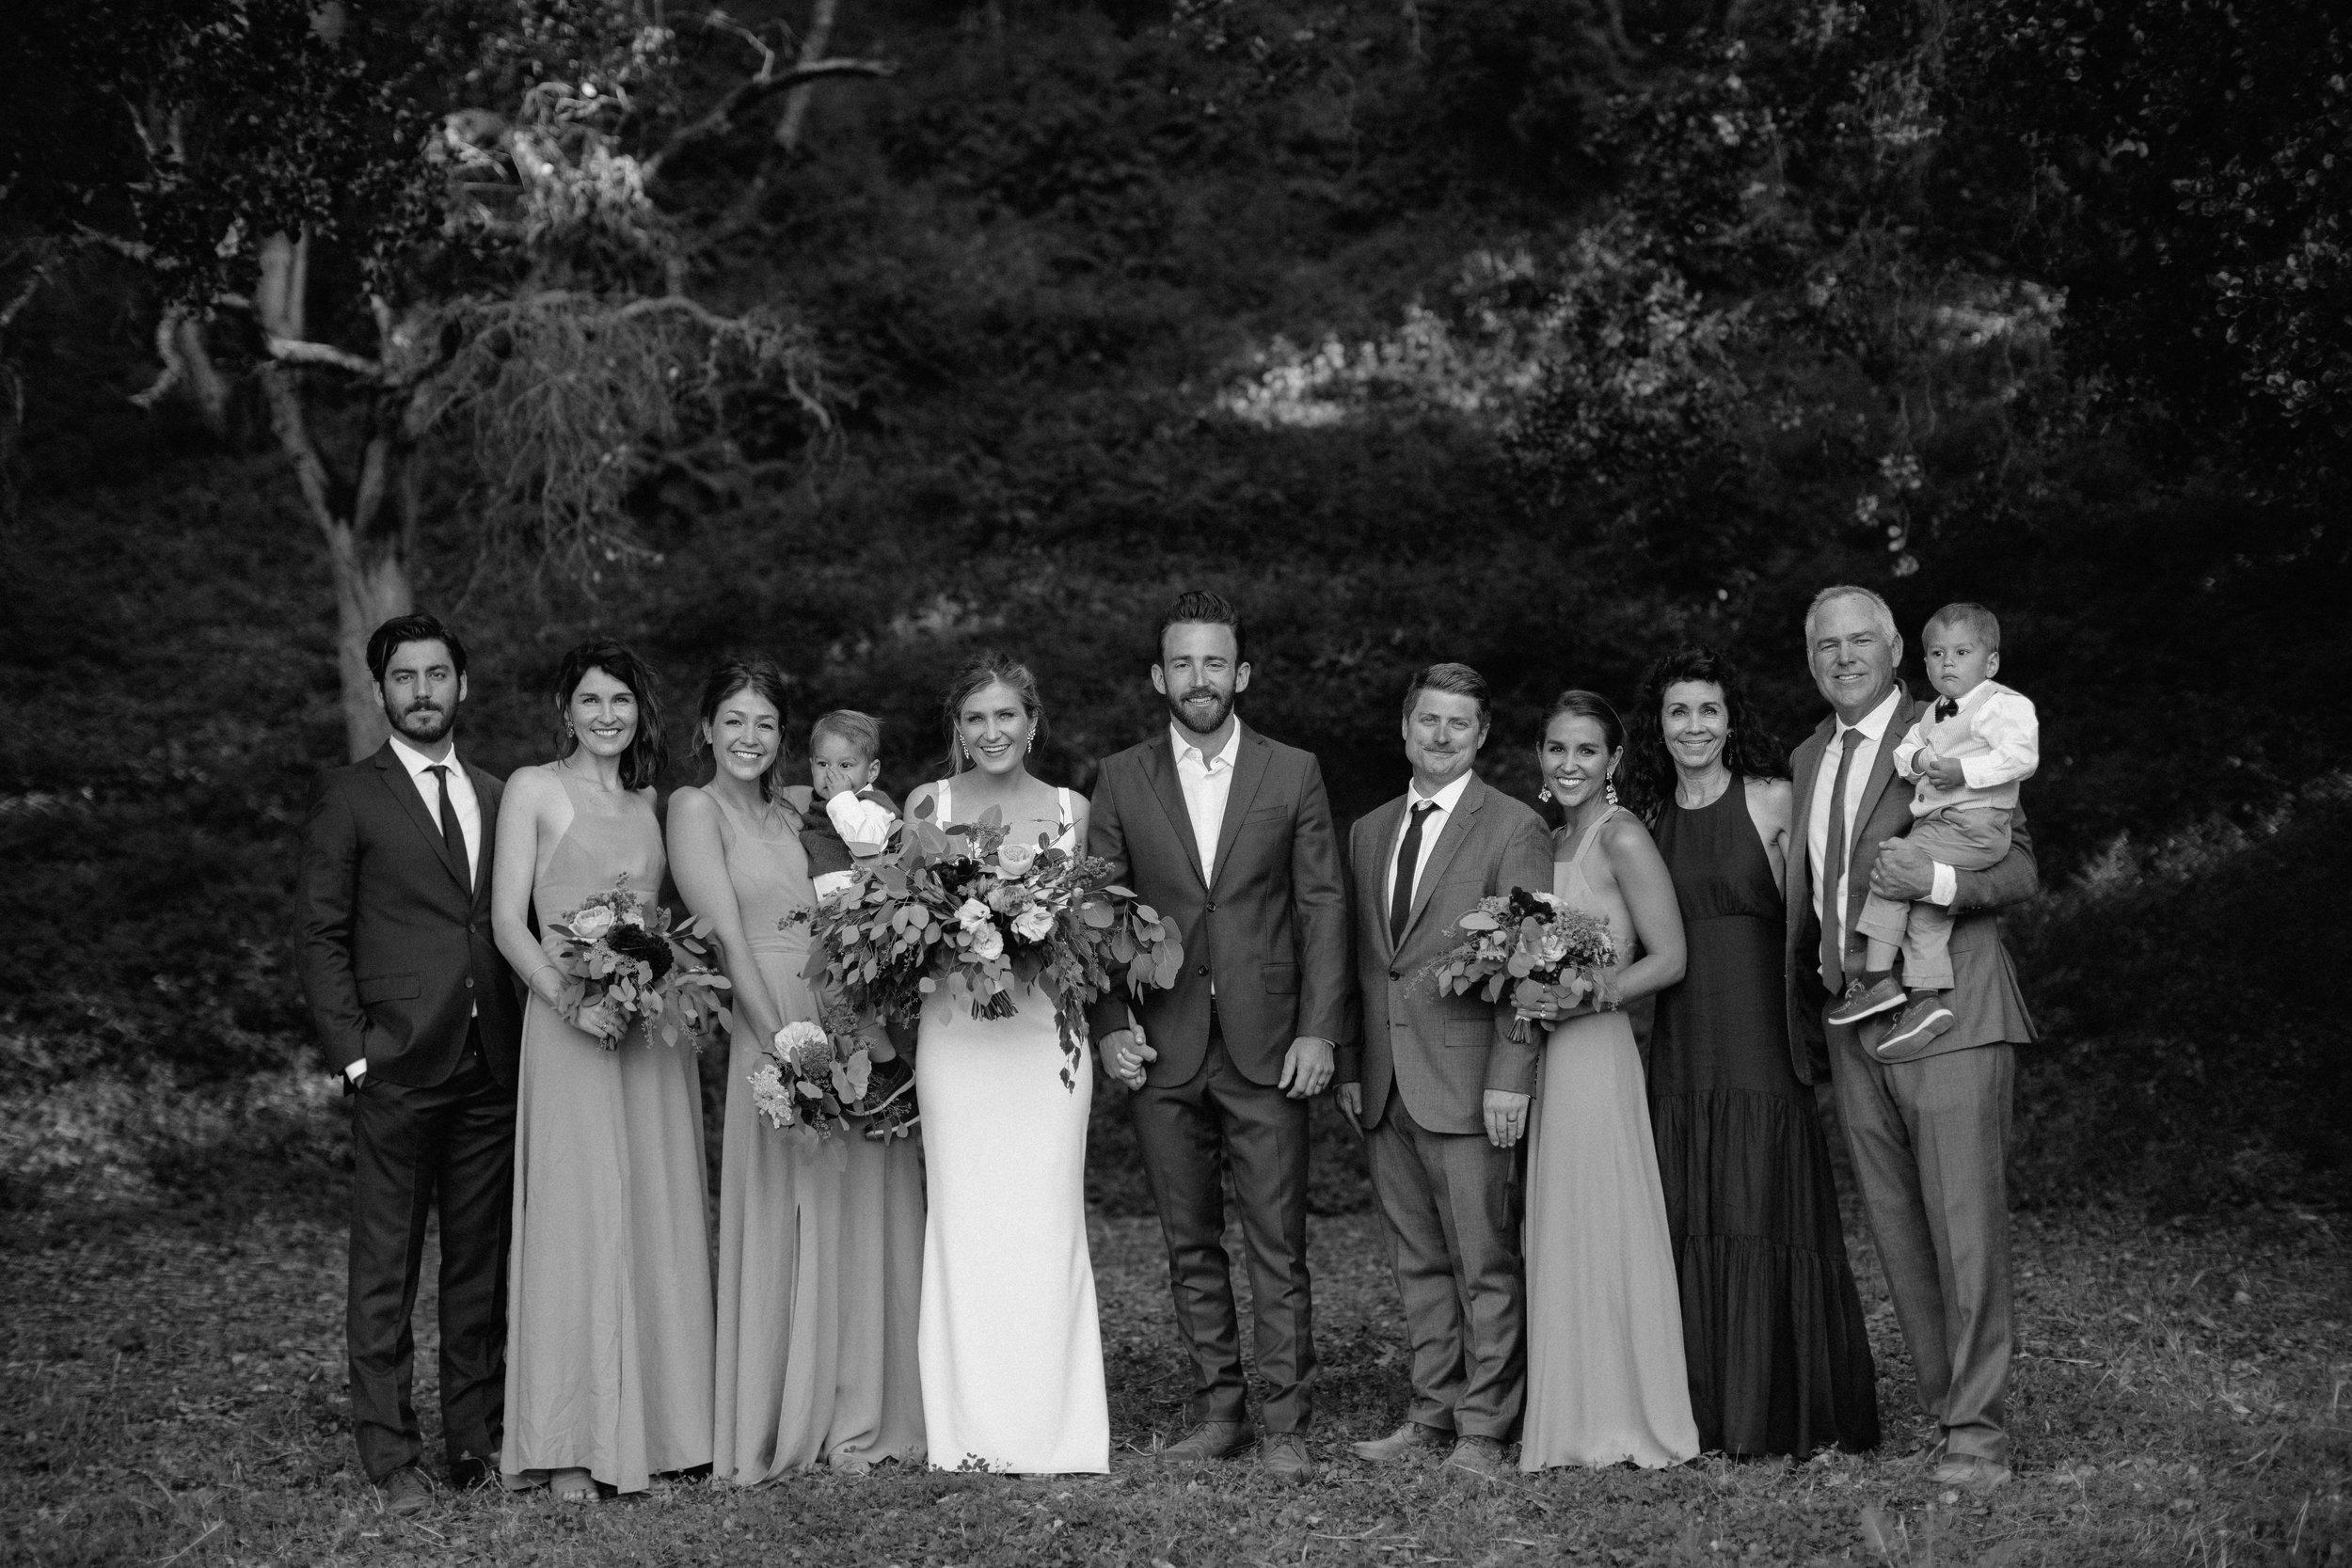 California-Bay-Area-Wedding-Anna-Howard-Studios-0001-2.jpg